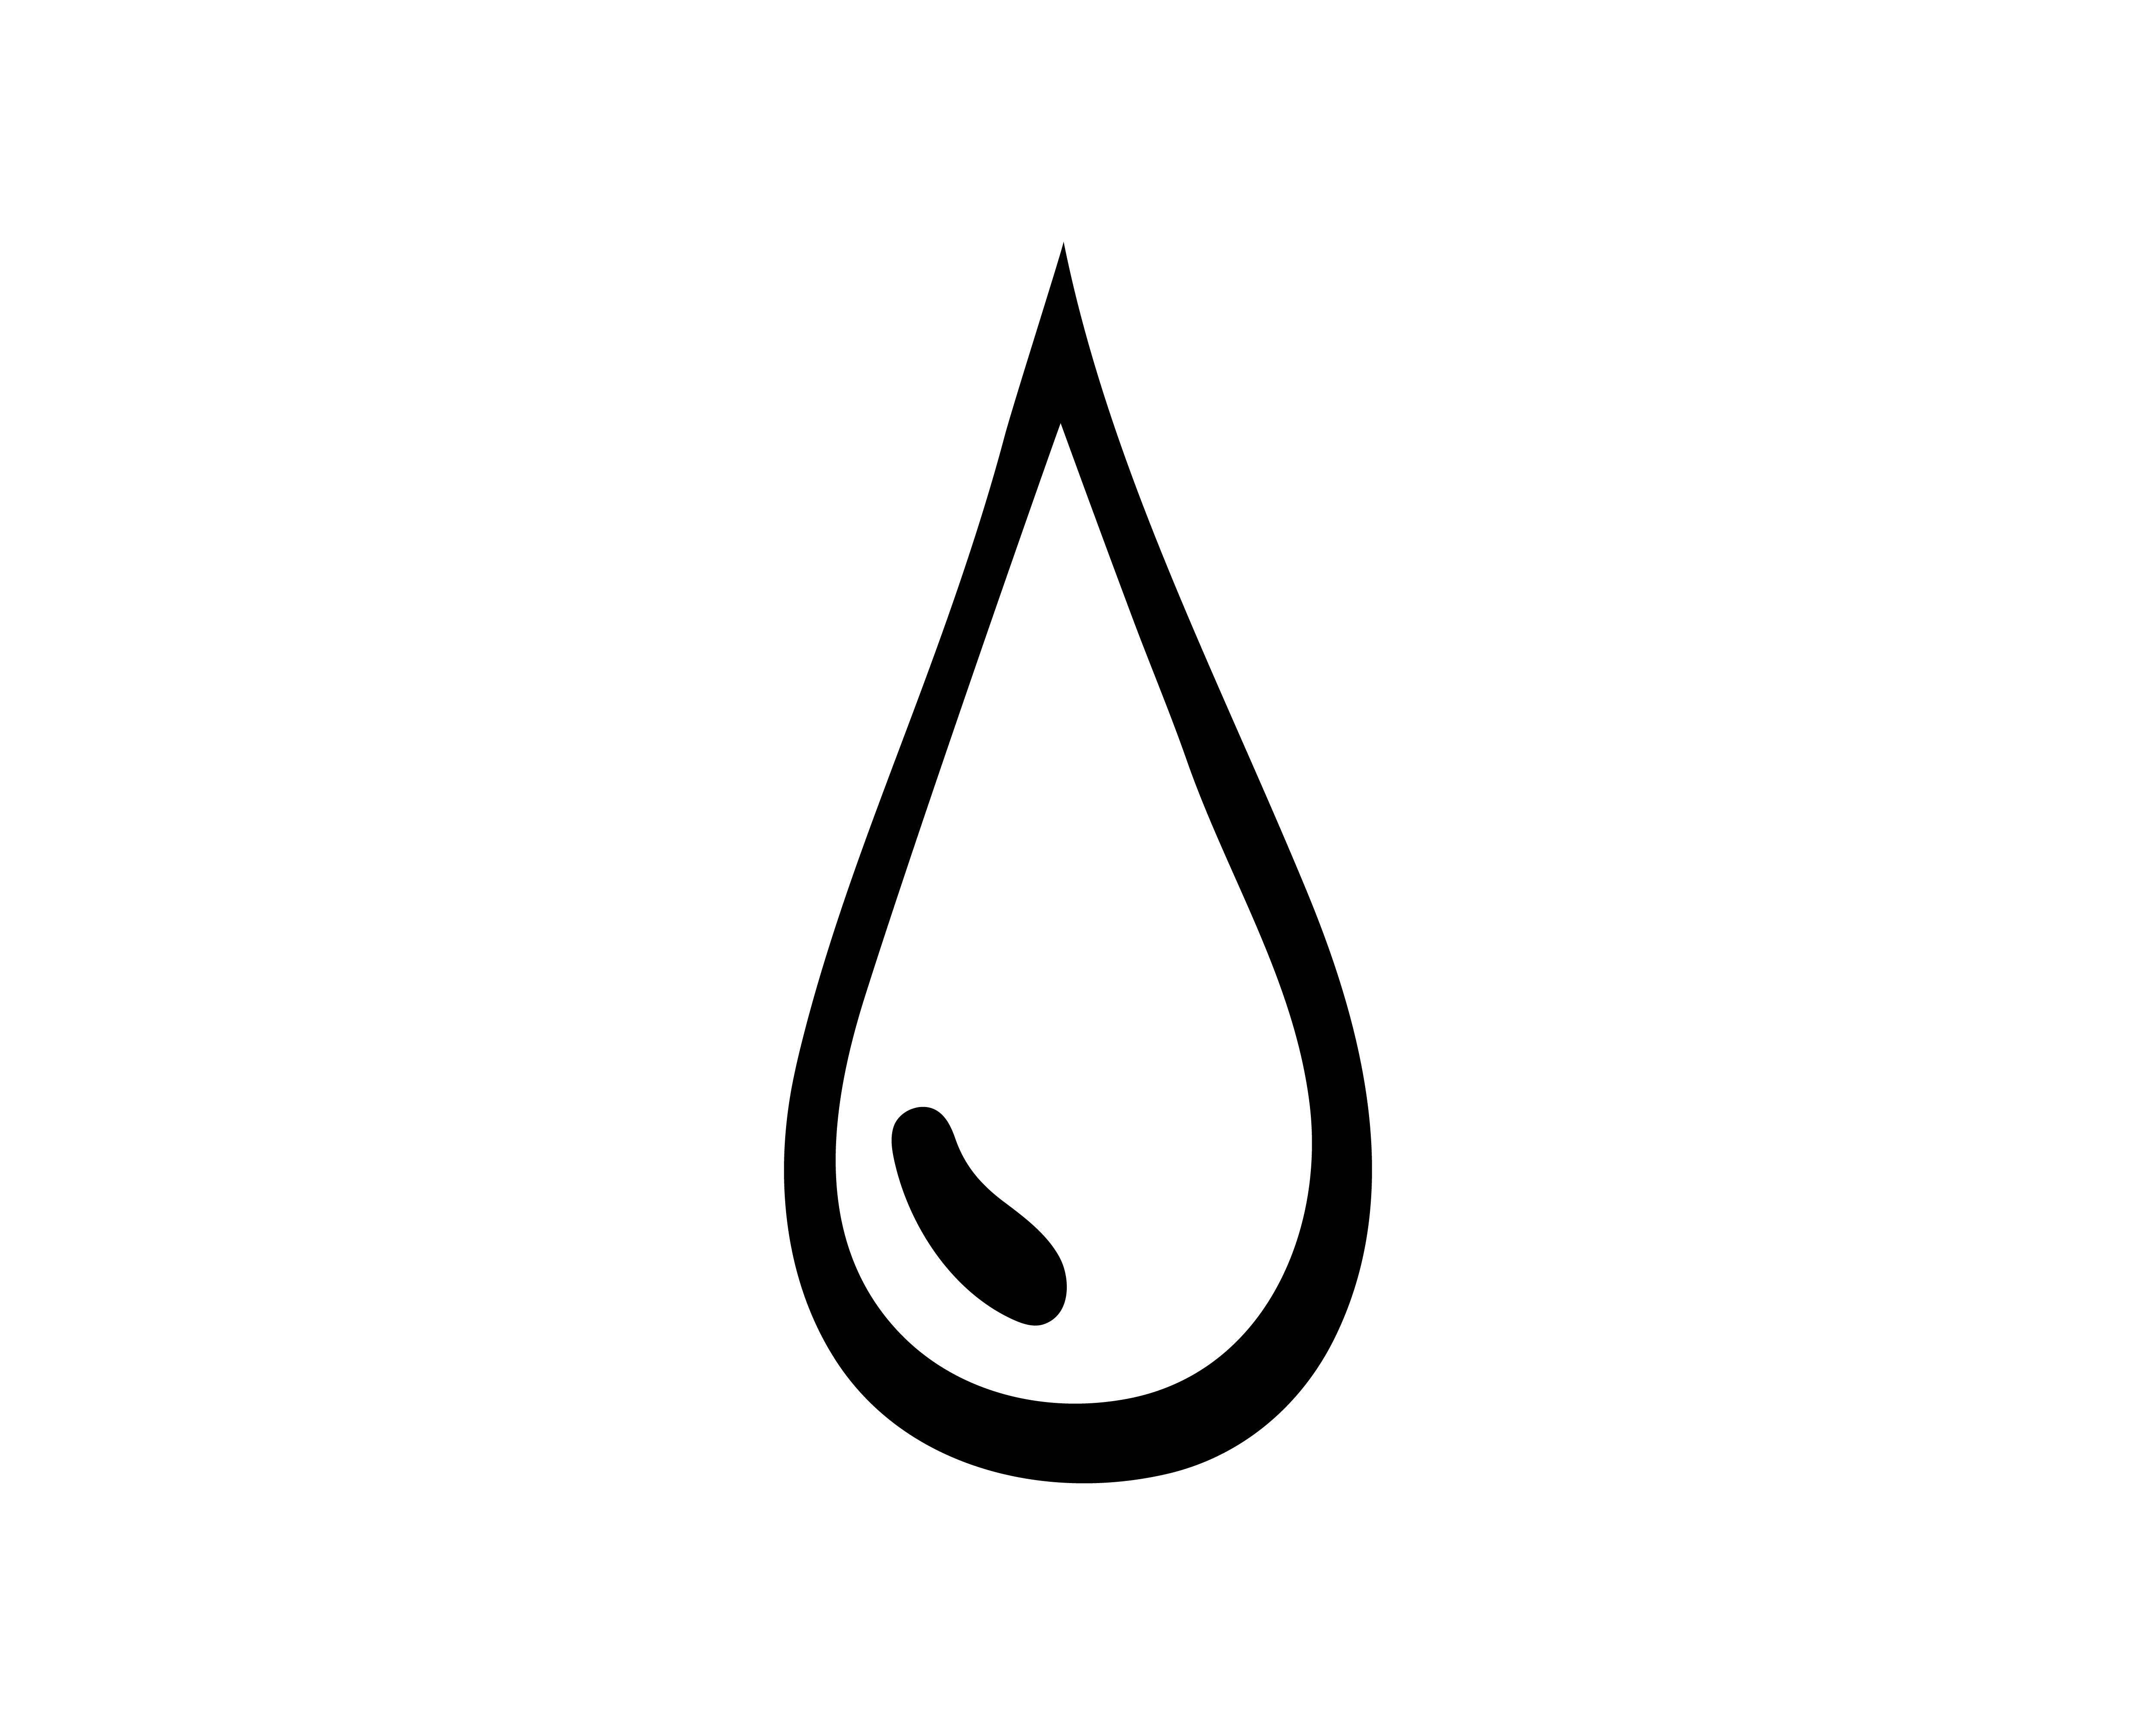 Water drop black n color logos - Download Free Vectors ...